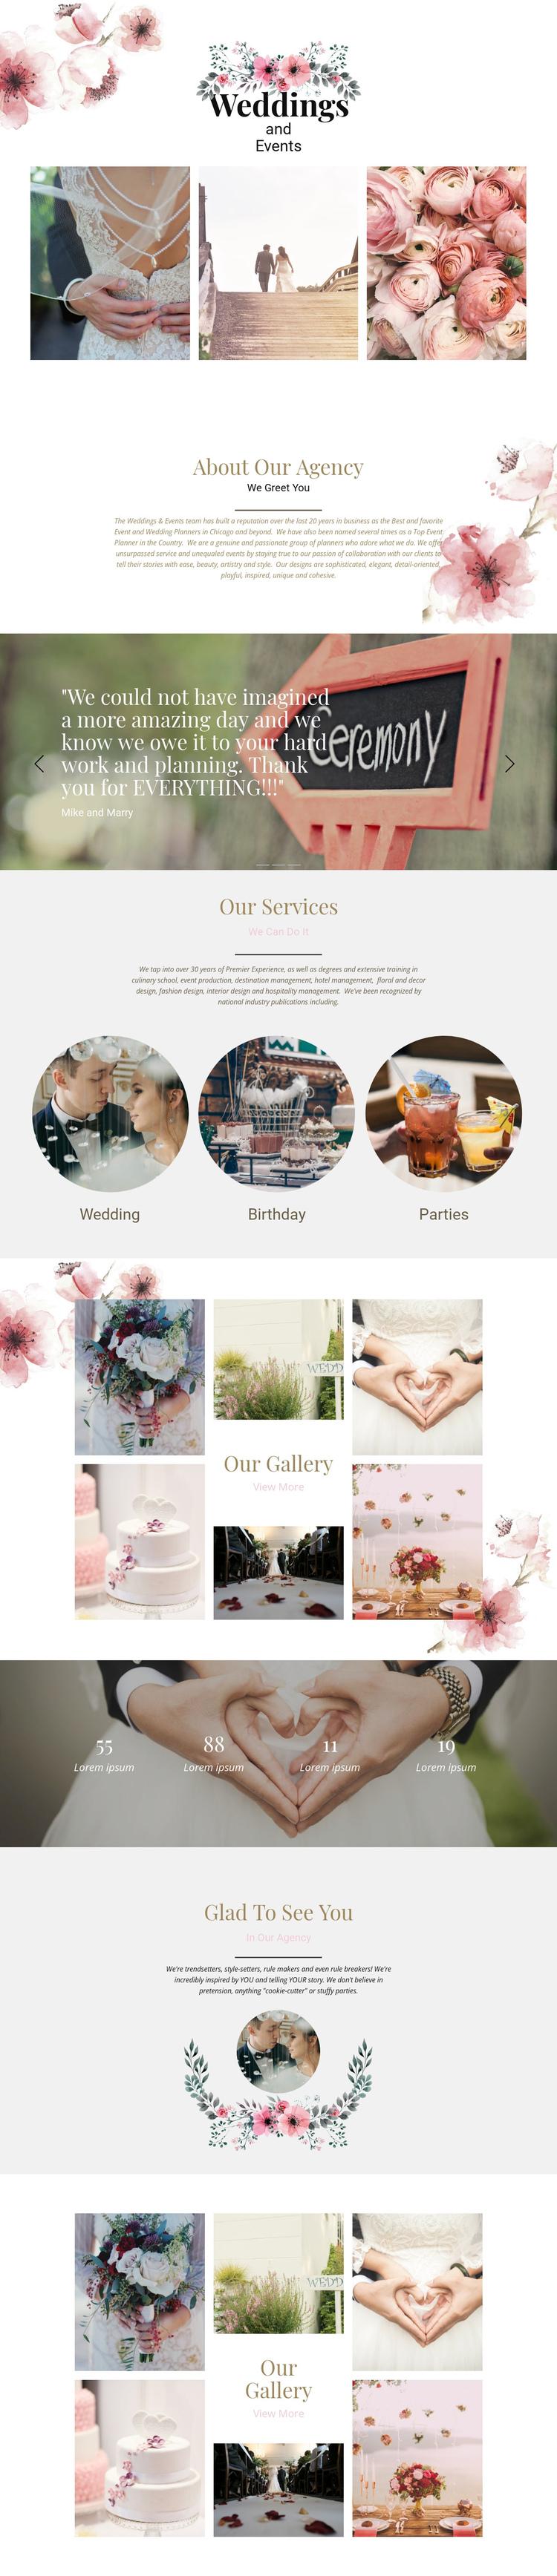 Moments of wedding Website Builder Software